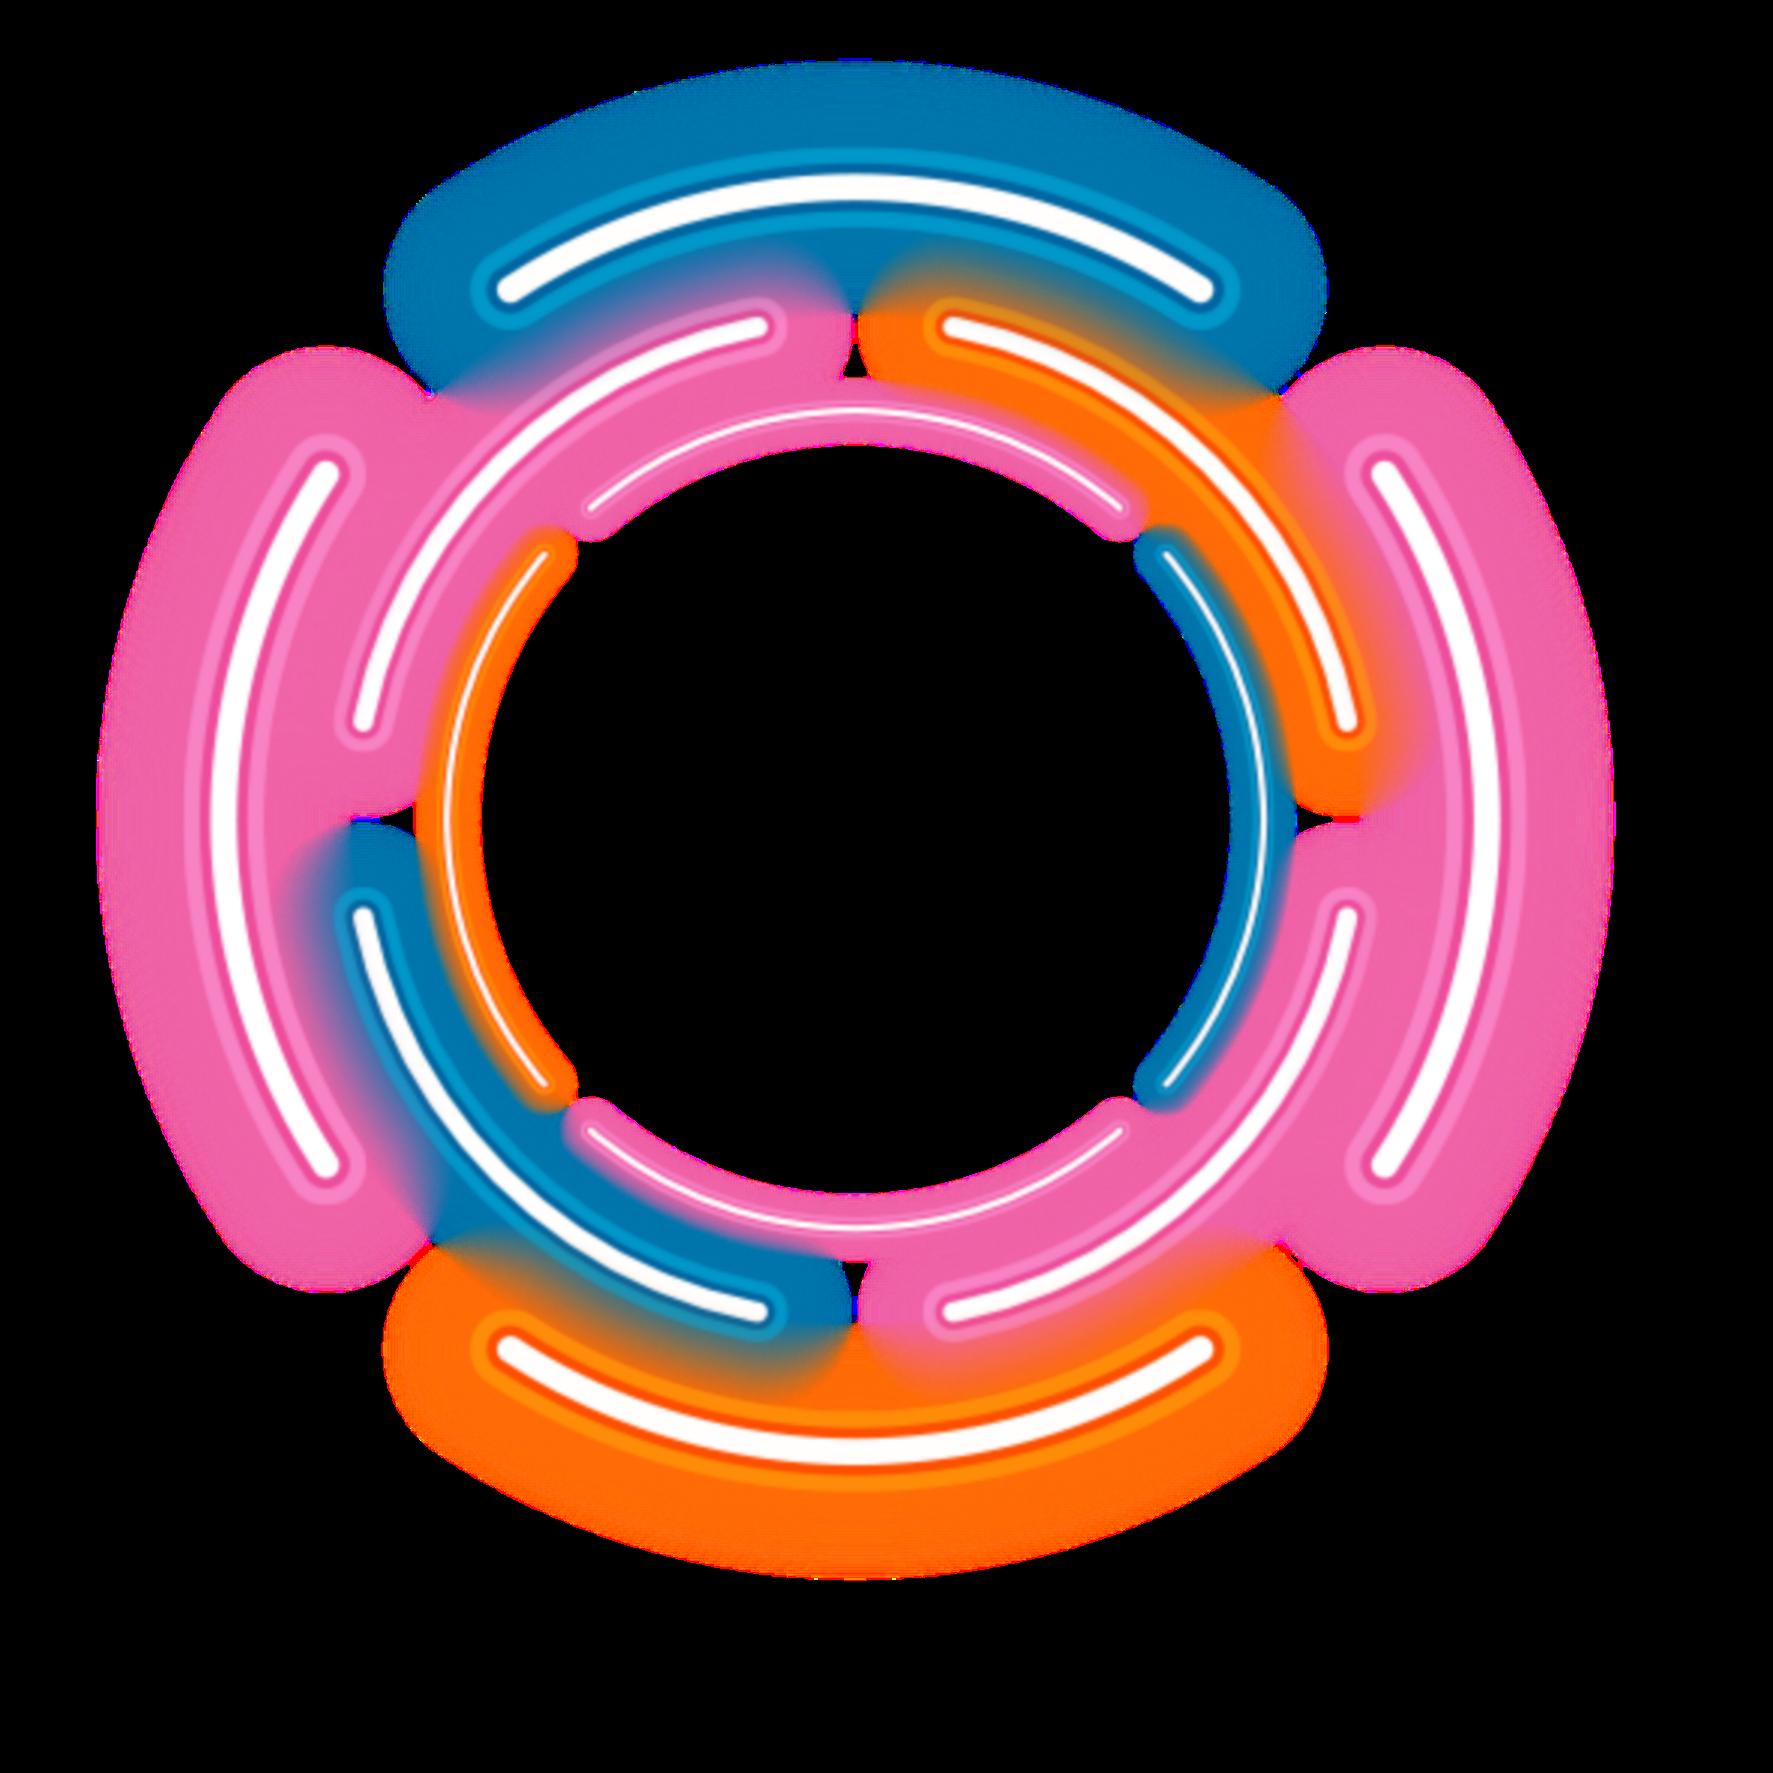 Neon Round Circle Rounds Yuvarlak Frame Frames Border Borders Geometric Geometry Figure Line Drawi Overlays Picsart Cartoon Wallpaper Hd Neon Png